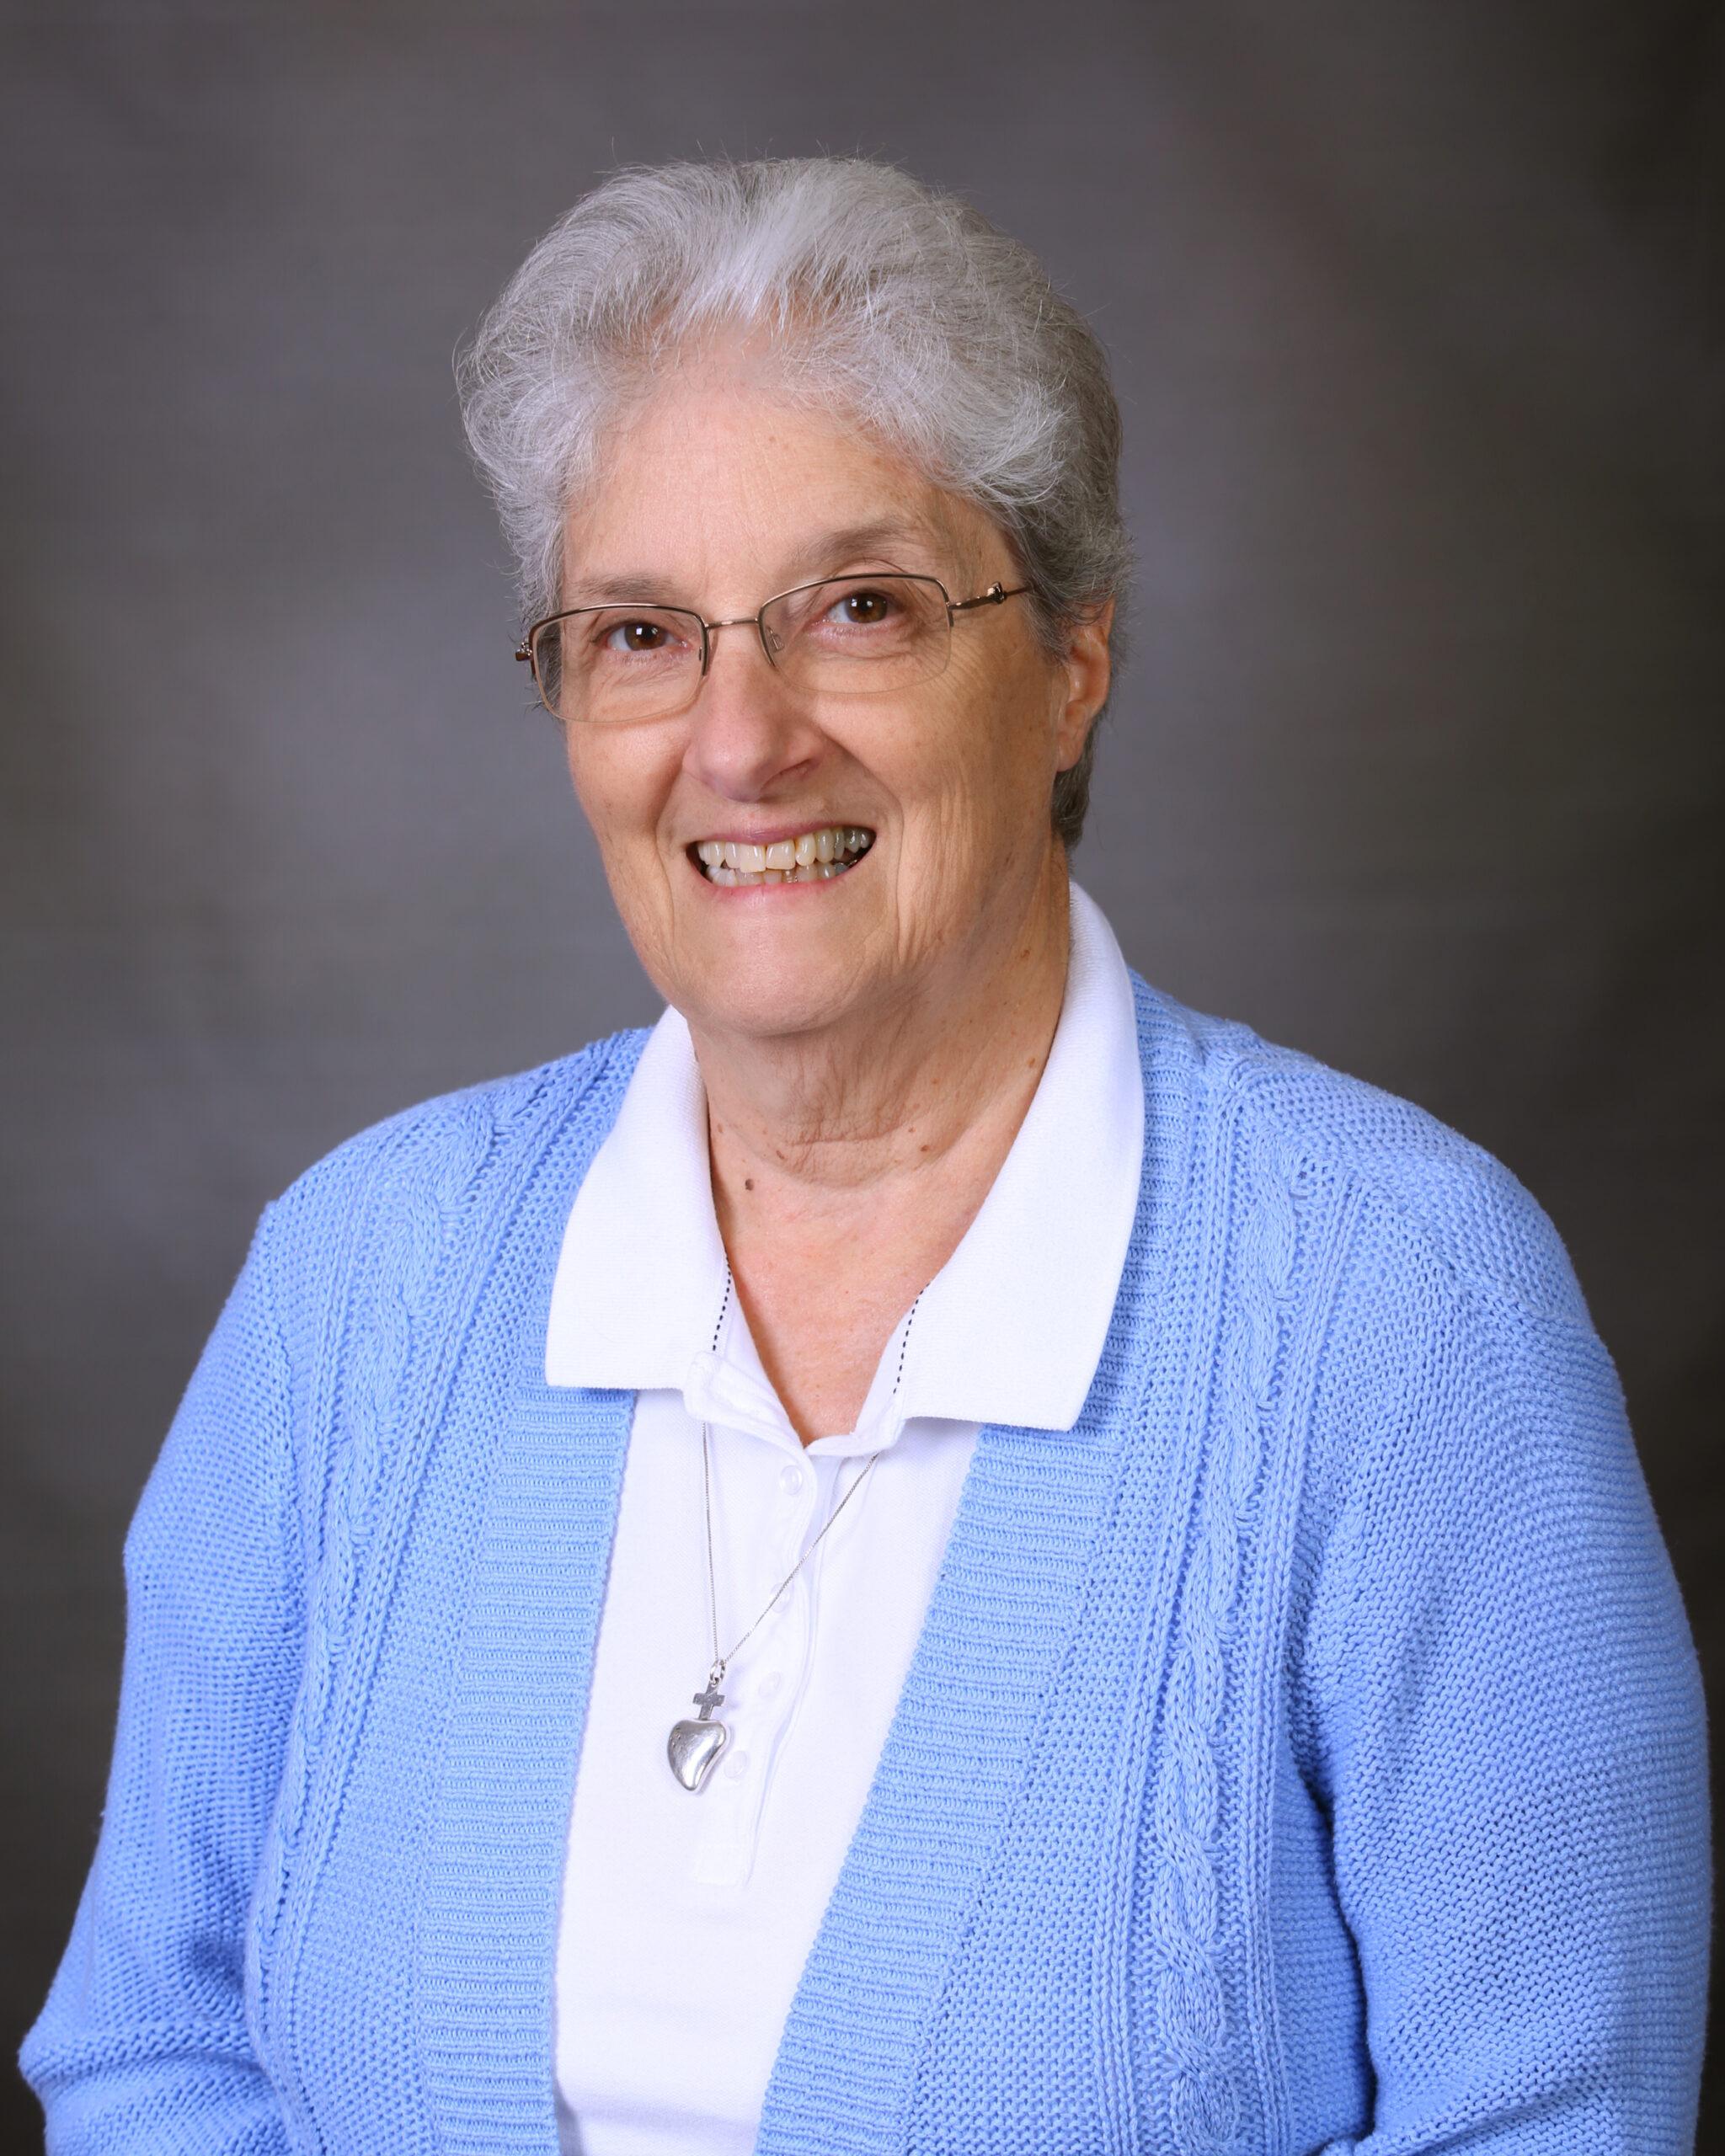 Sister Fran Schumer, ASC